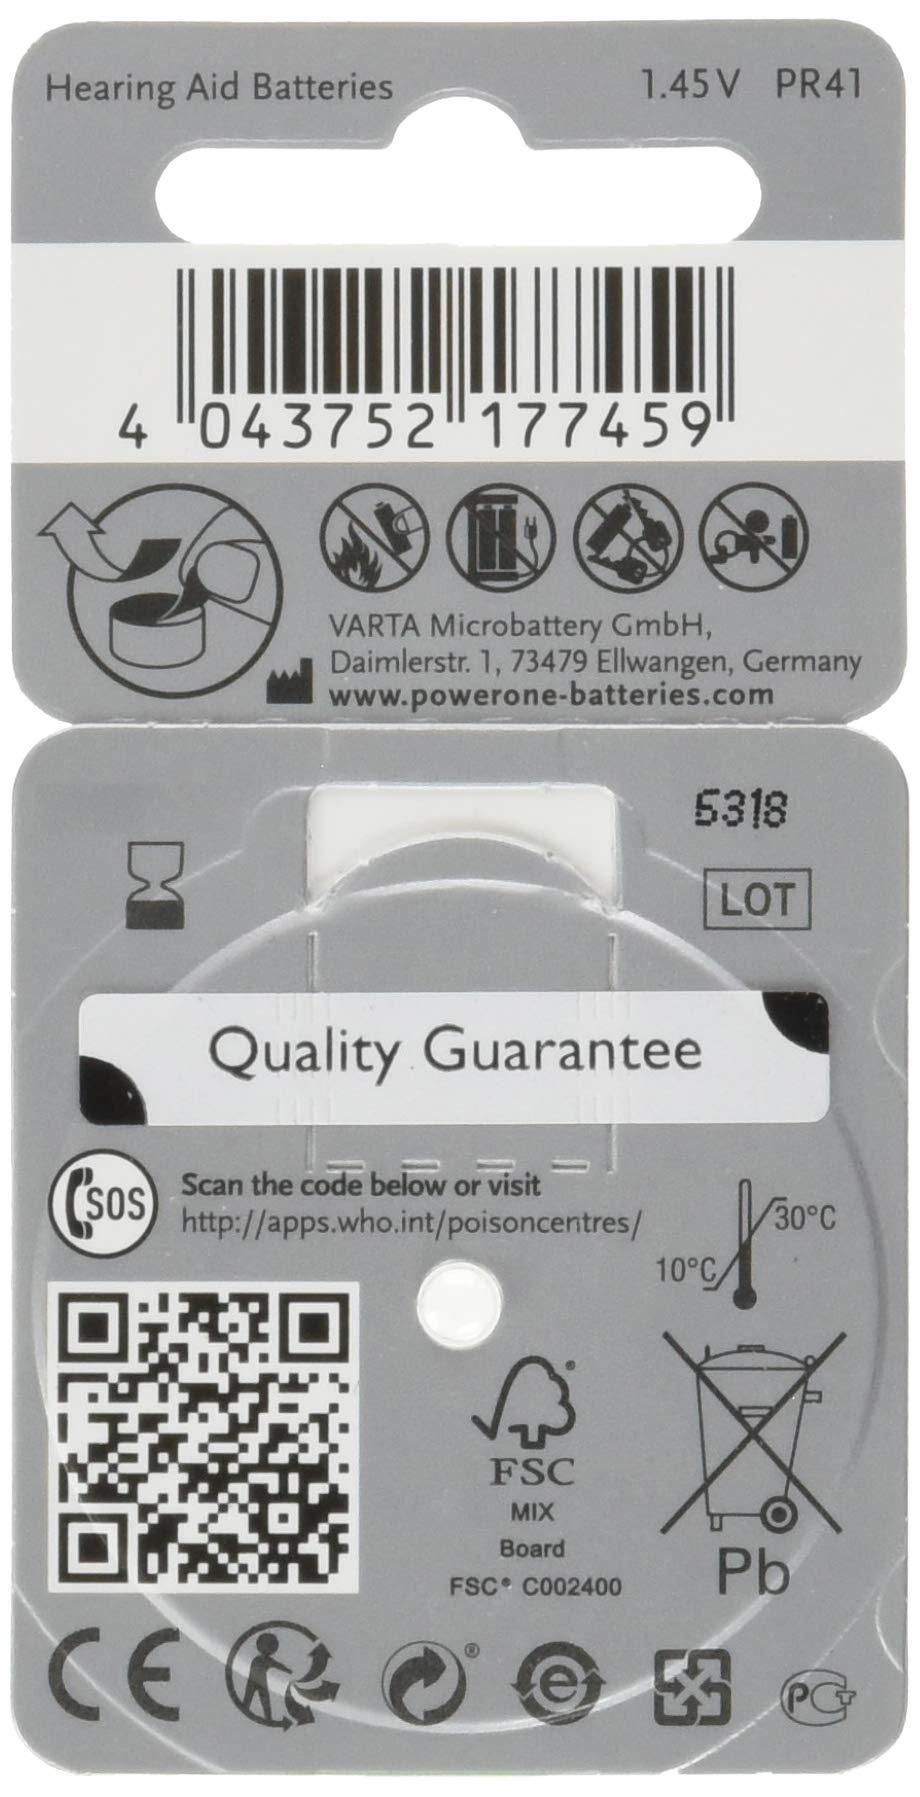 Hearing Aid Battery Powerone Size 312 No Mercury, 60 Batteries